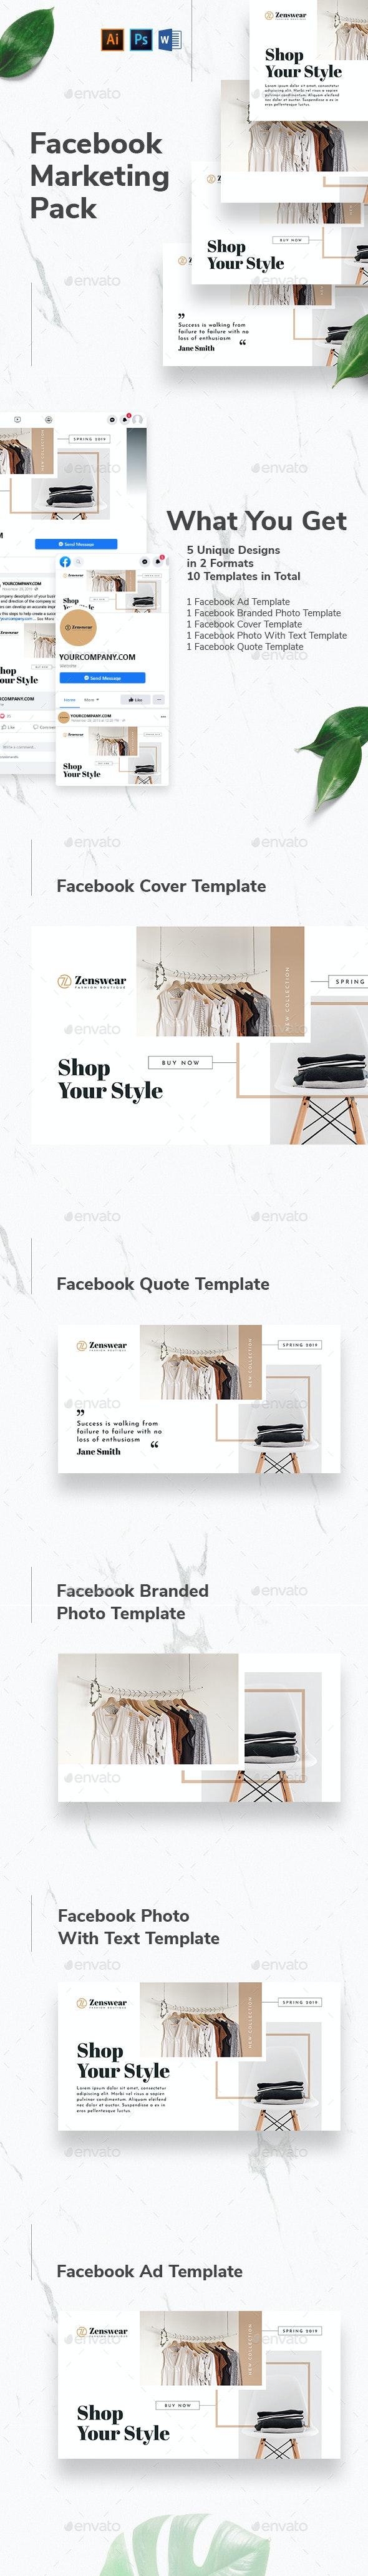 Boutique Facebook Marketing Materials - Facebook Timeline Covers Social Media